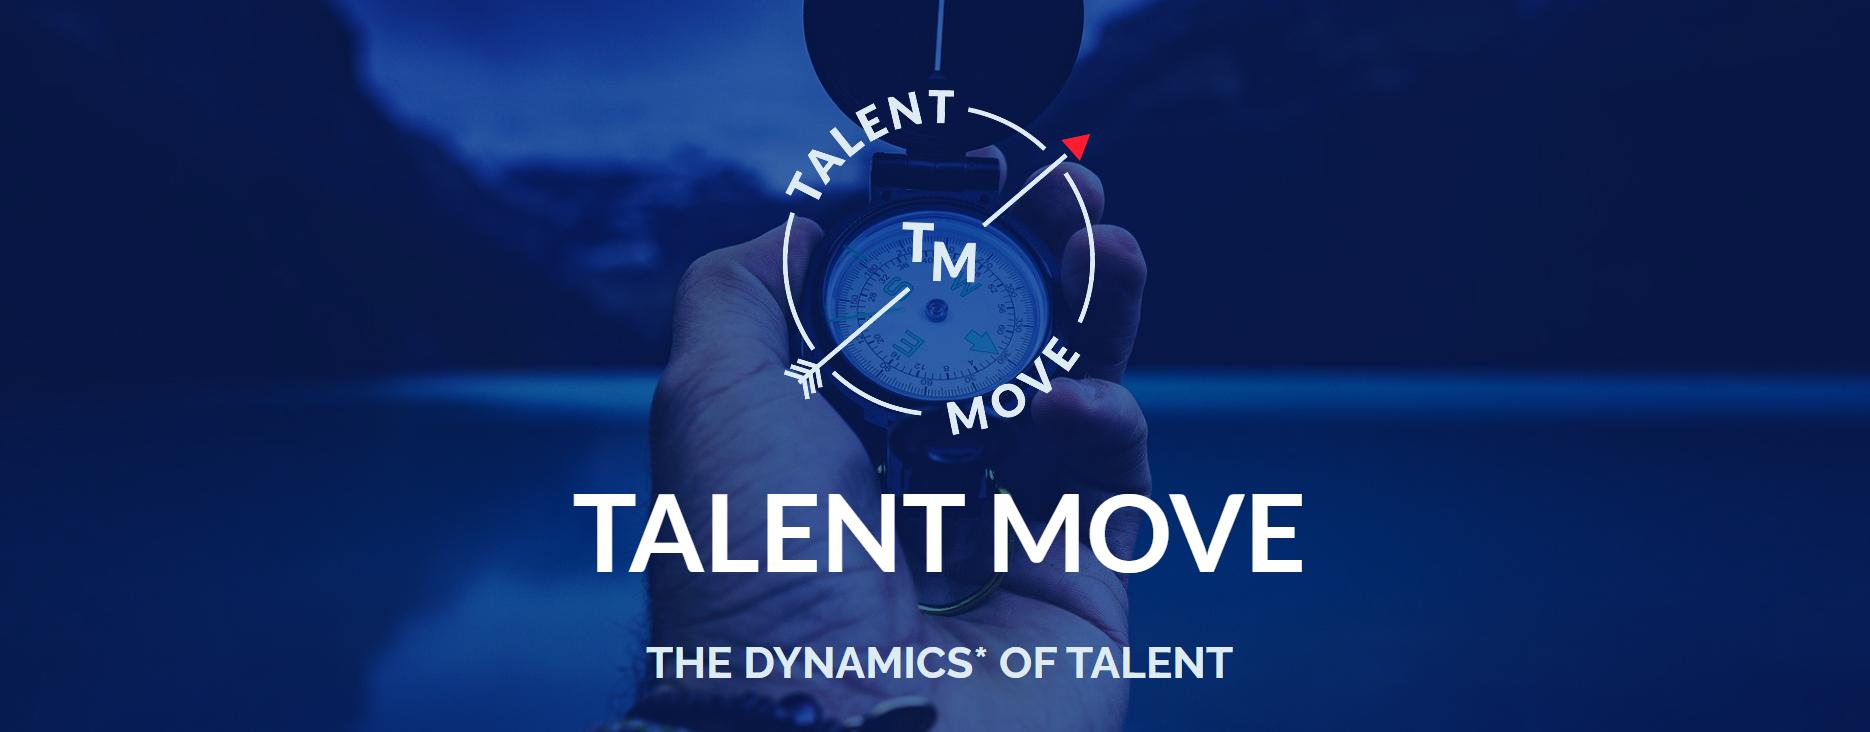 TalentMove Banner